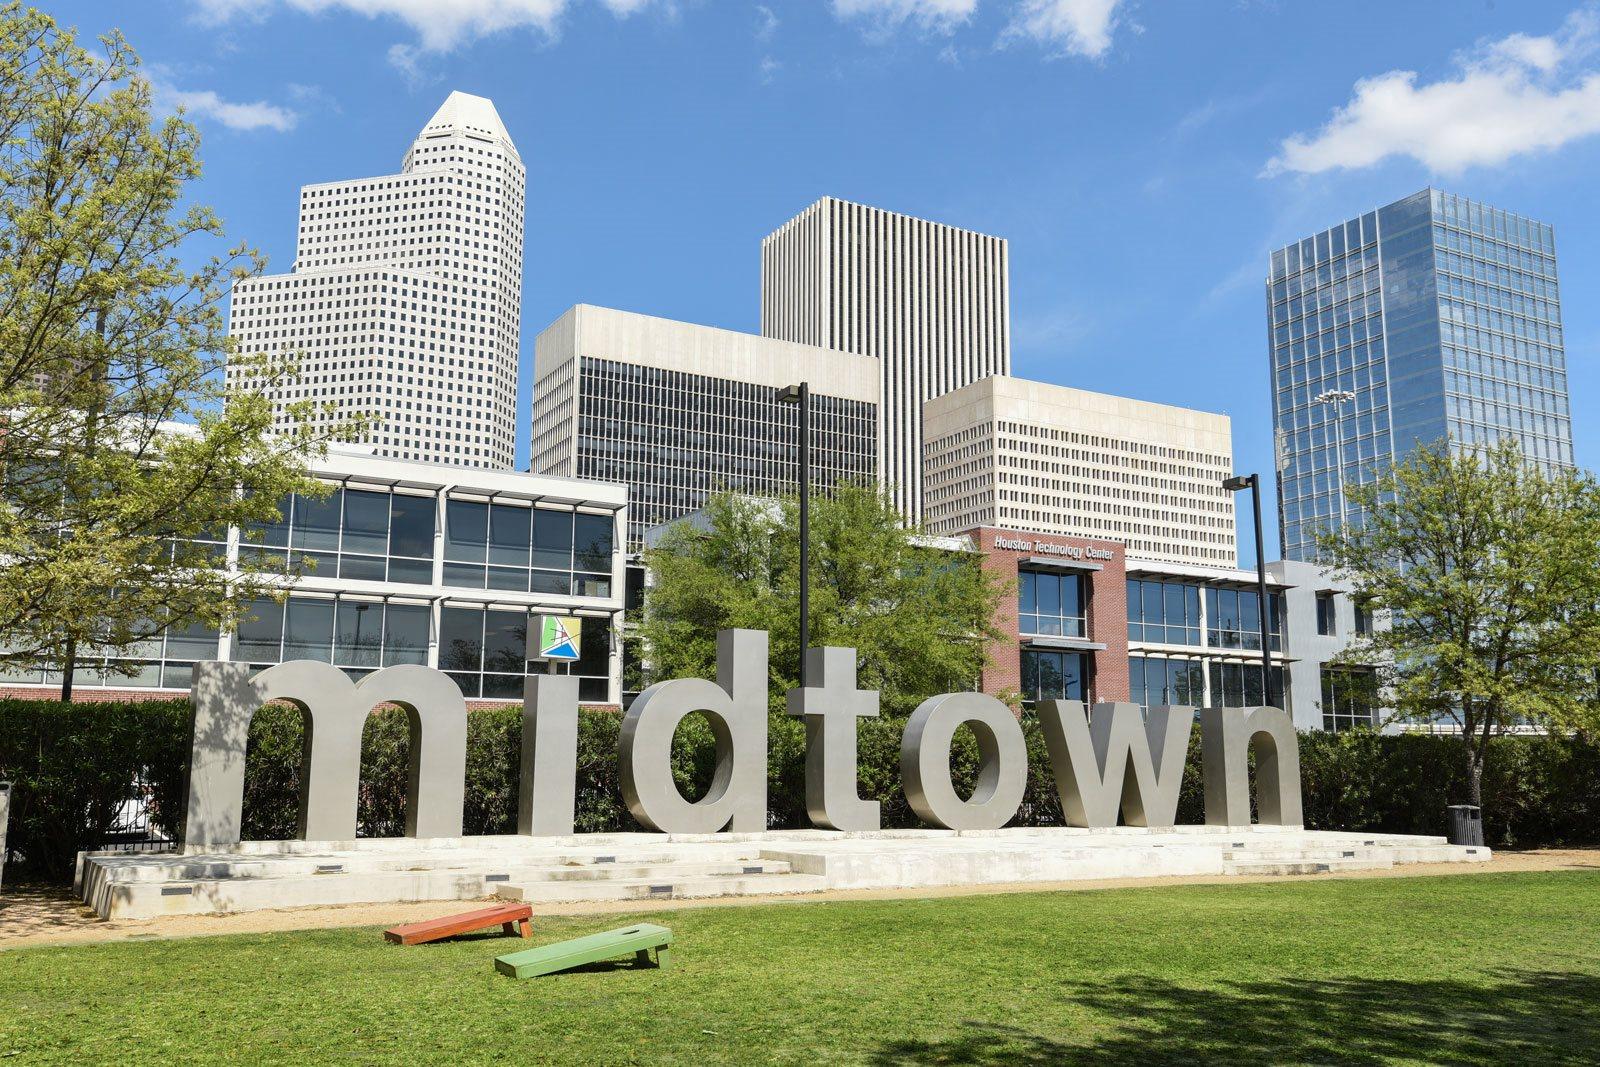 Very Walkable Neighborhood at Midtown Houston by Windsor, 77002, Houston